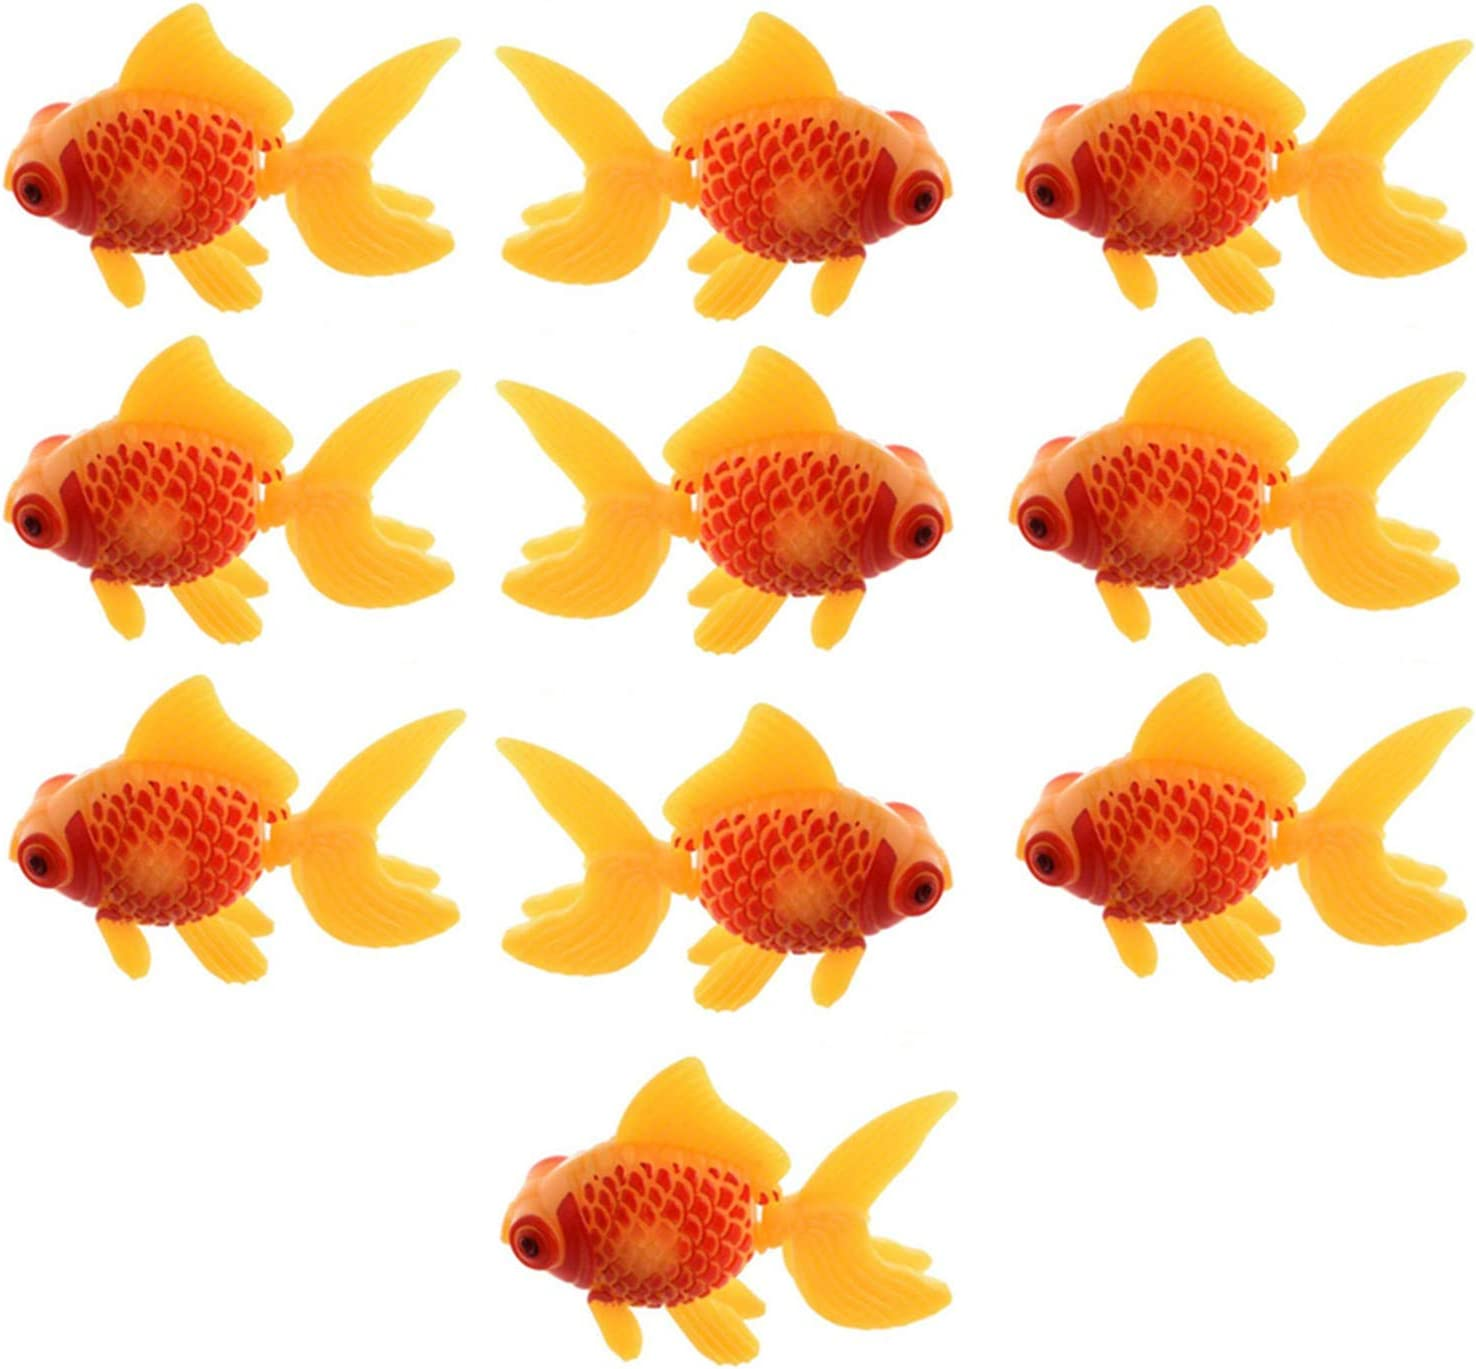 XMHF Aquarium Fish Bowl Tank Artificial Floating Plastic Yellow Red Decor Goldfish Ornament Fish Tank Decoration 10PCS